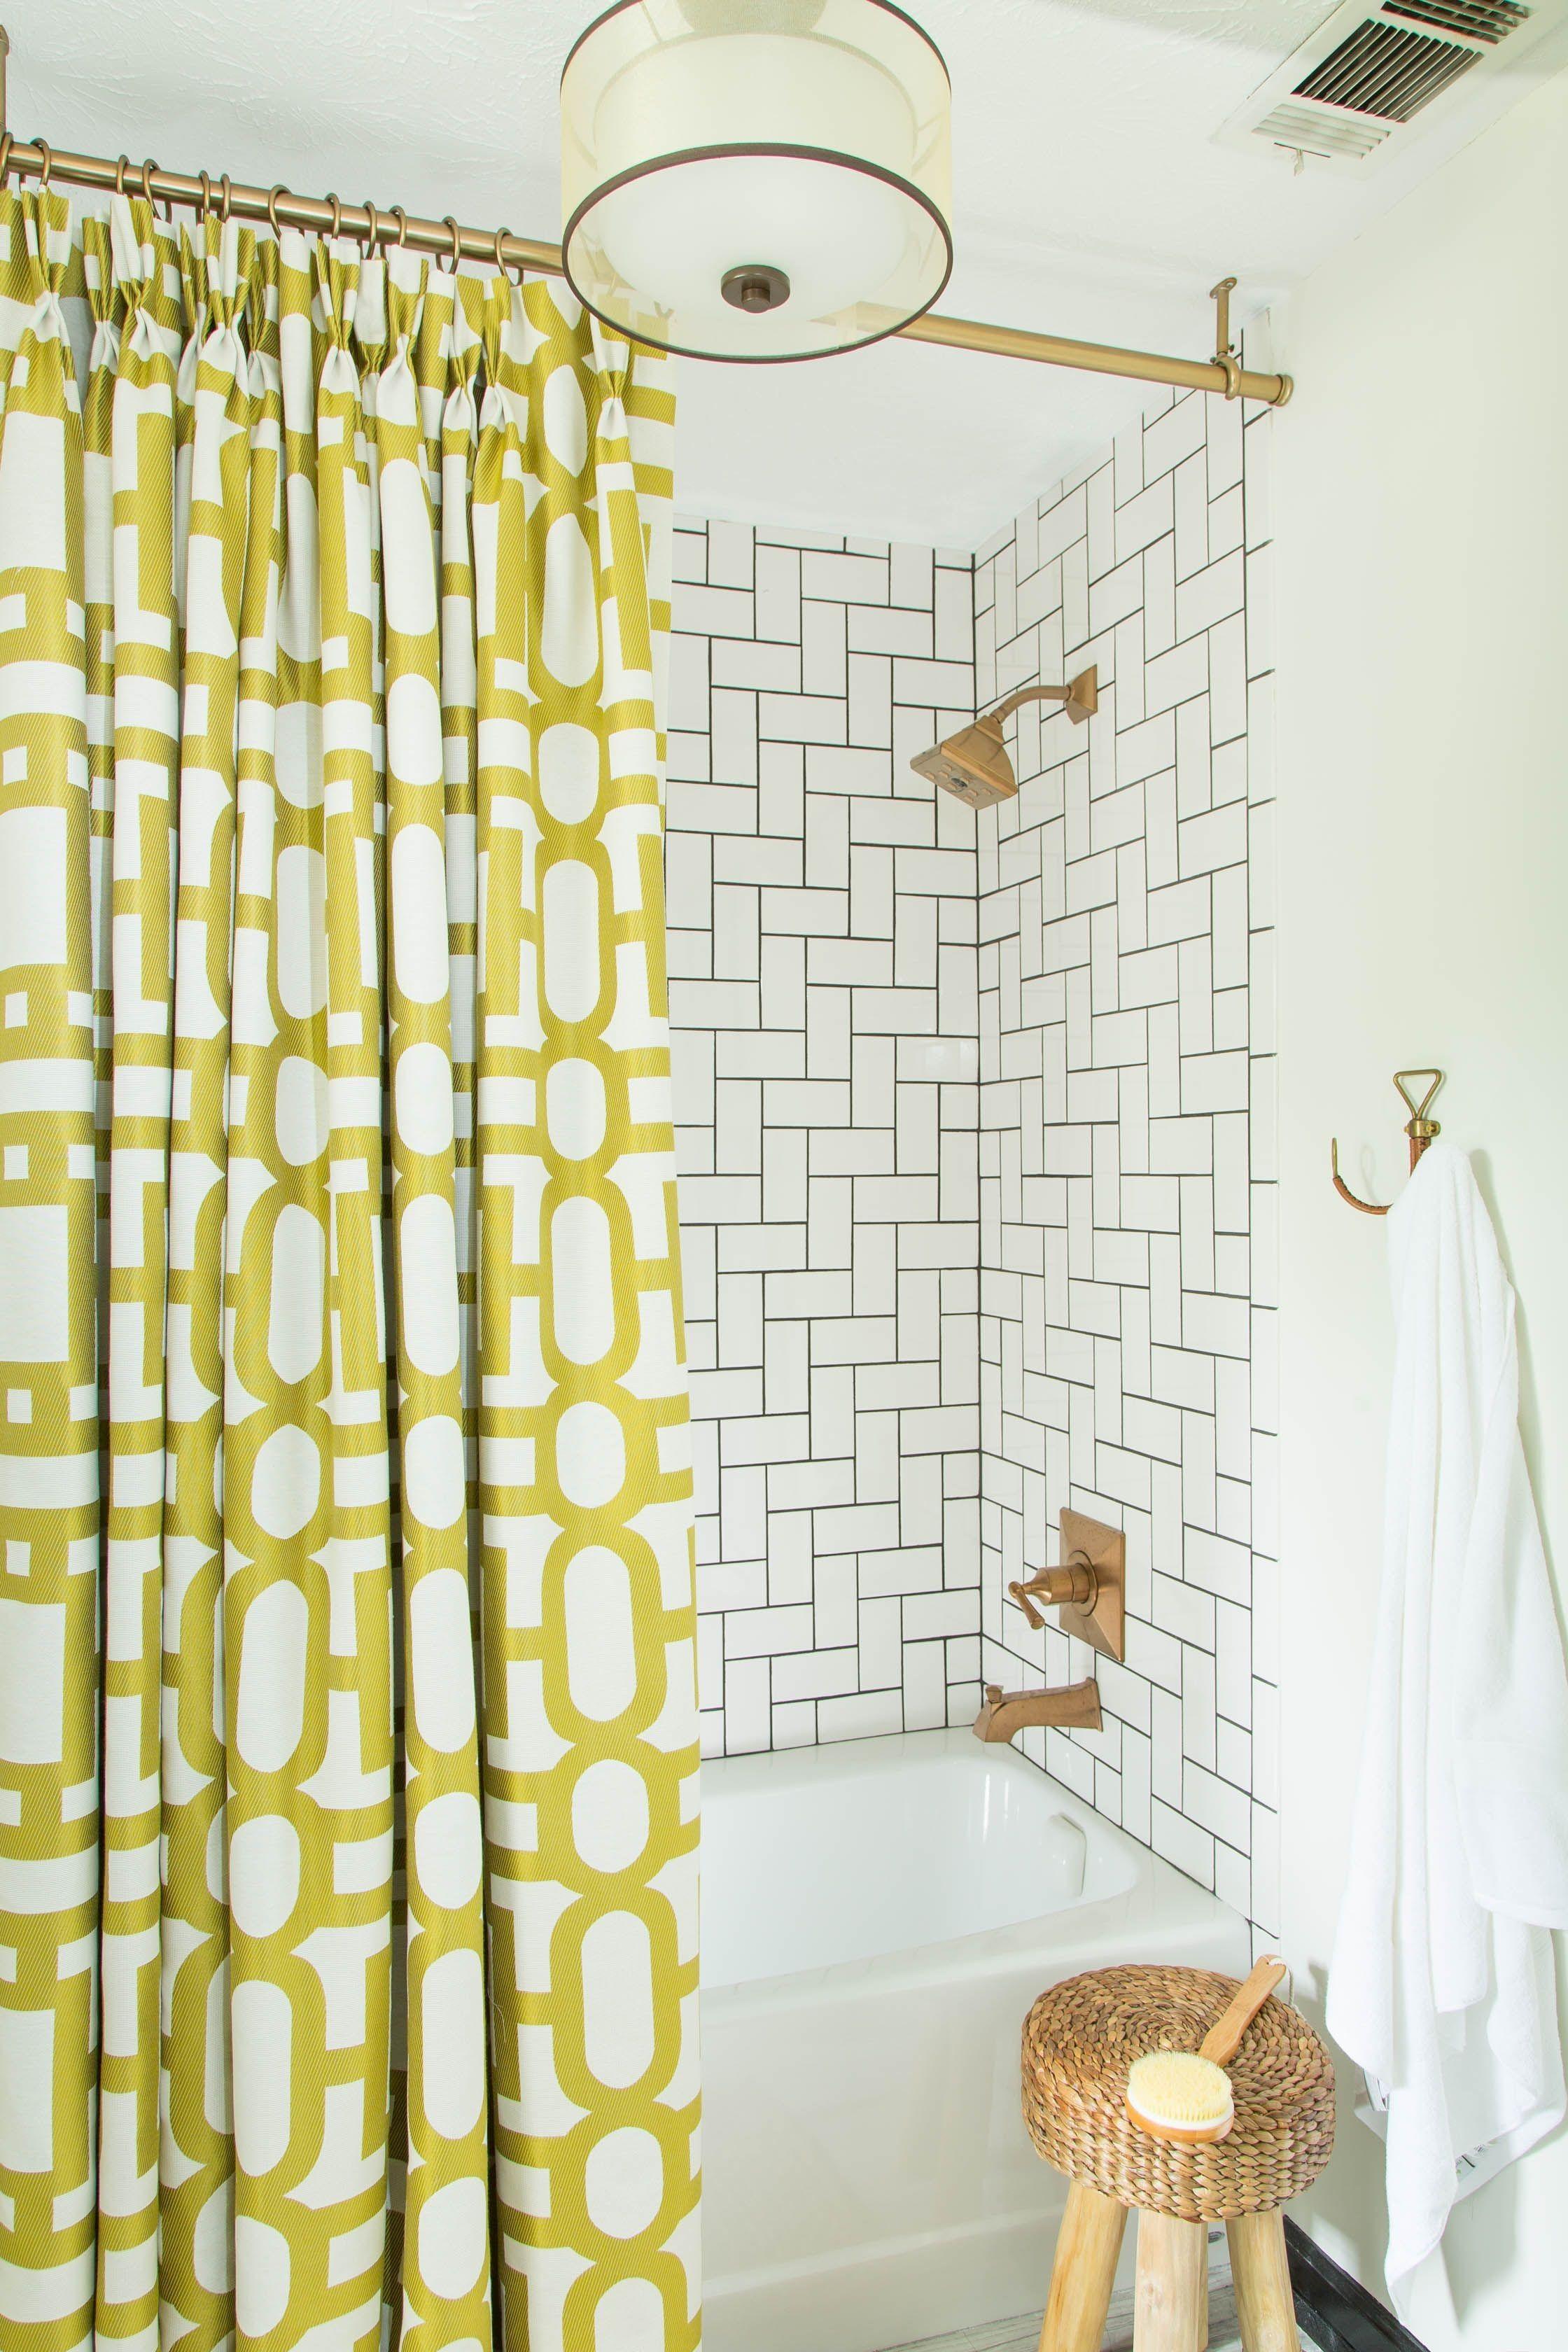 Luxury 7 Foot Shower Curtain